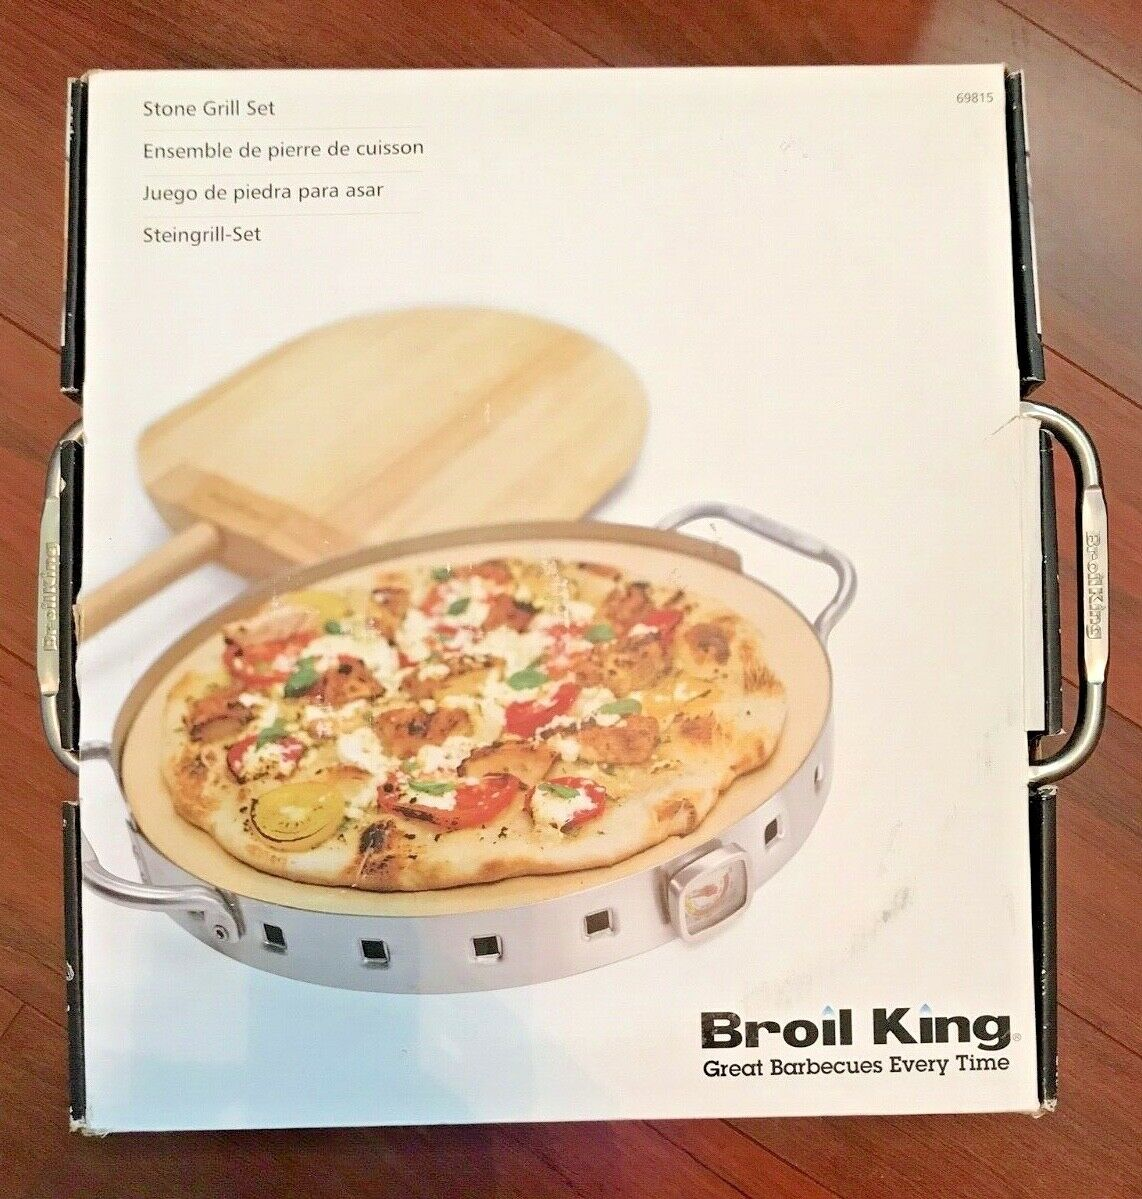 Broil King imperial de calidad de restaurante Parrilla de cásCochea de Pizza de piedra de la Pizza & Set 69815